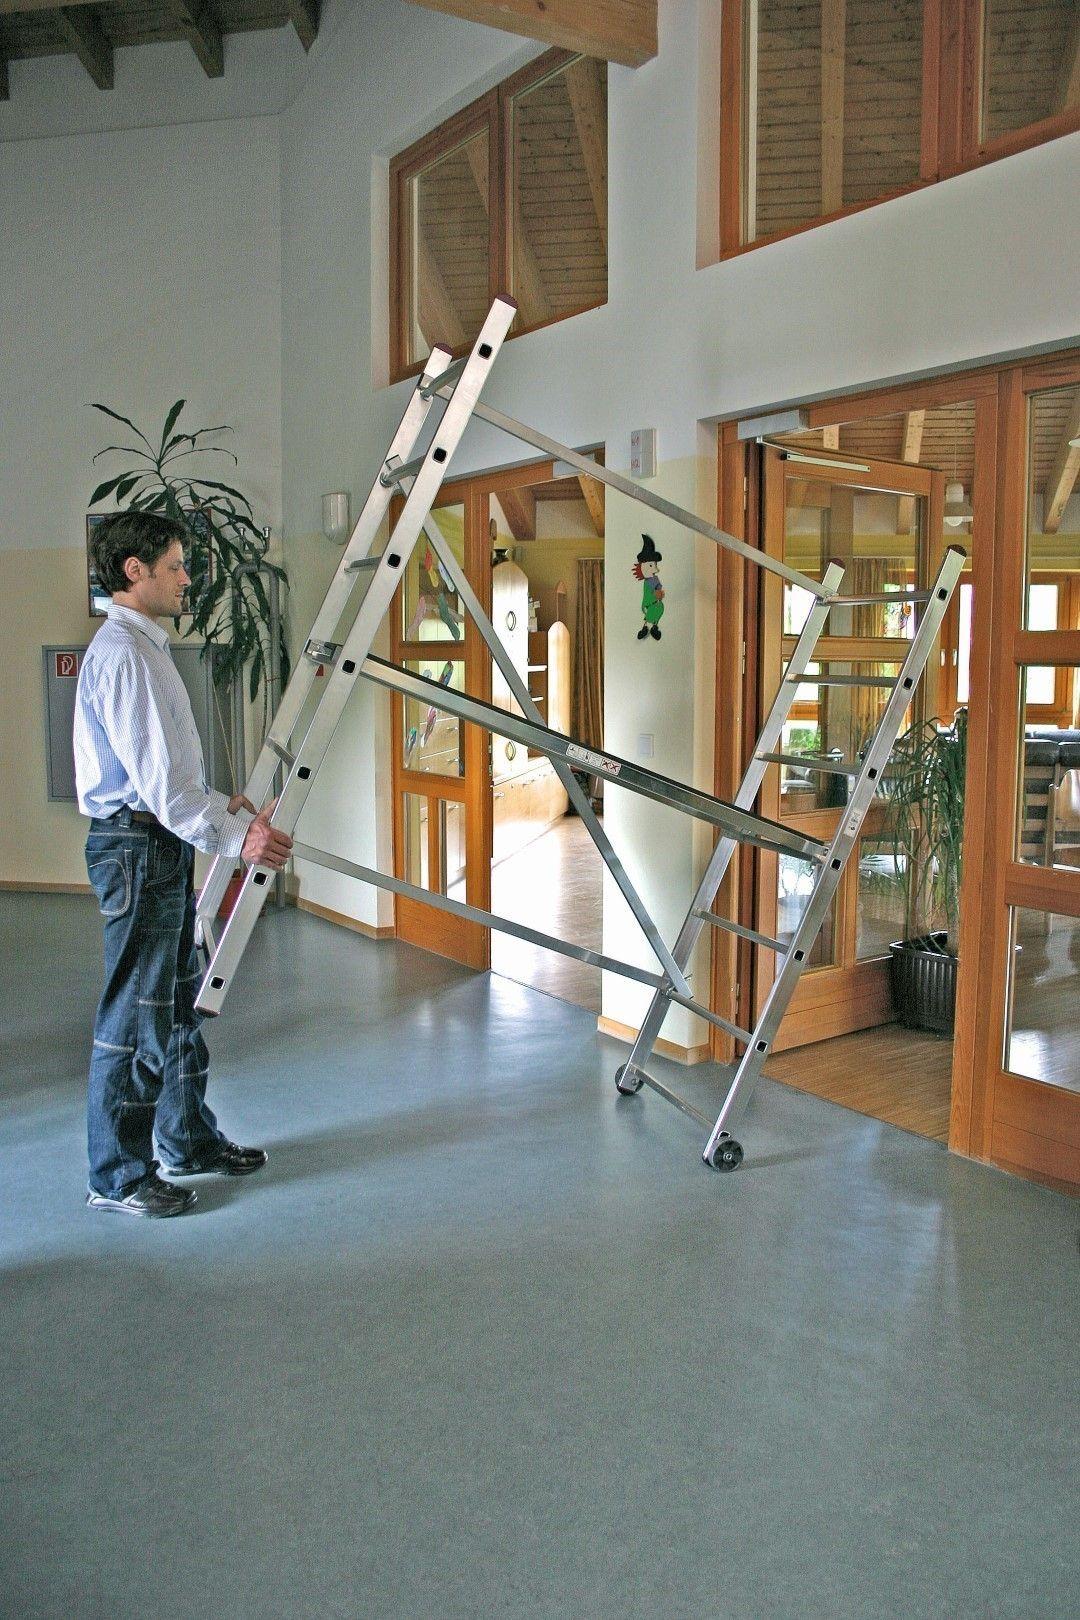 Slika KRAUSE CORDA SKELA POKRETNA RADNA VISINA 3,00m NOSIVOST 150 kg